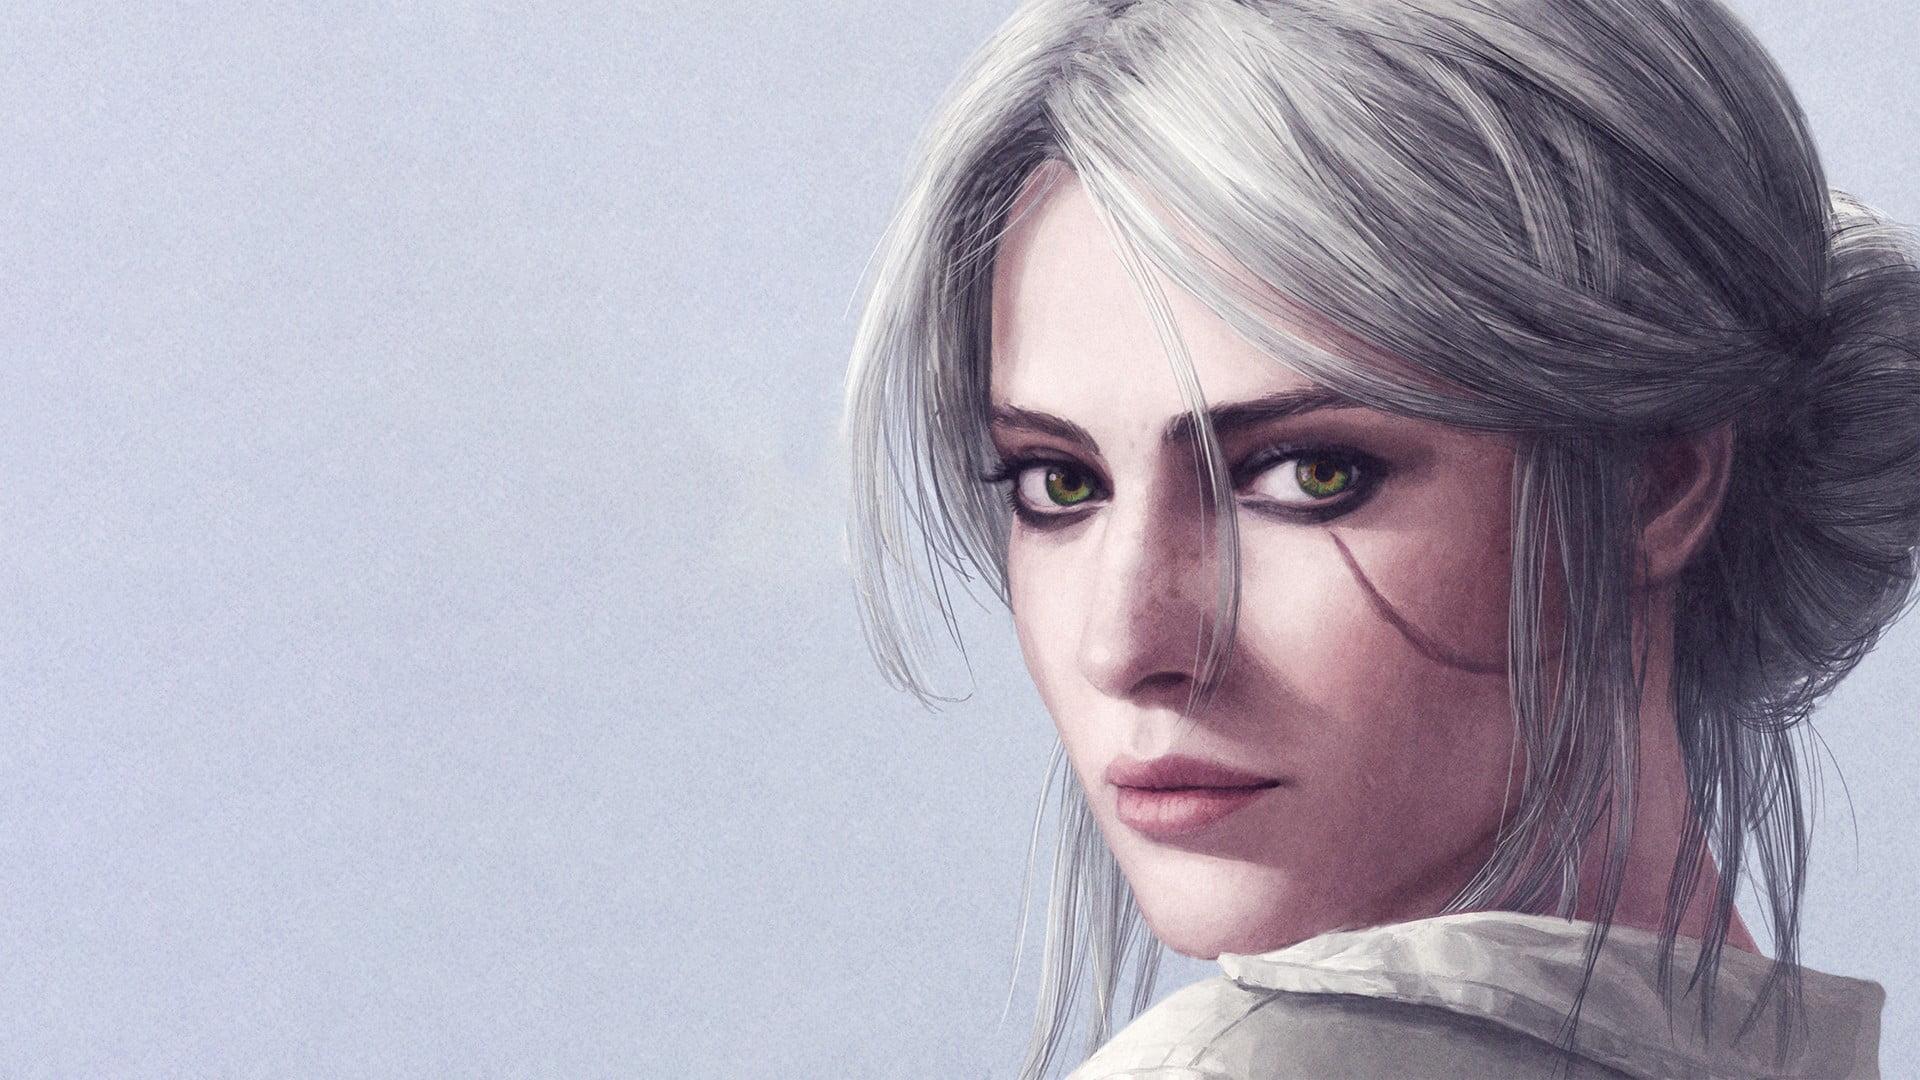 Gray haired woman drawing Ciri artwork Cirilla Fiona Elen 1920x1080